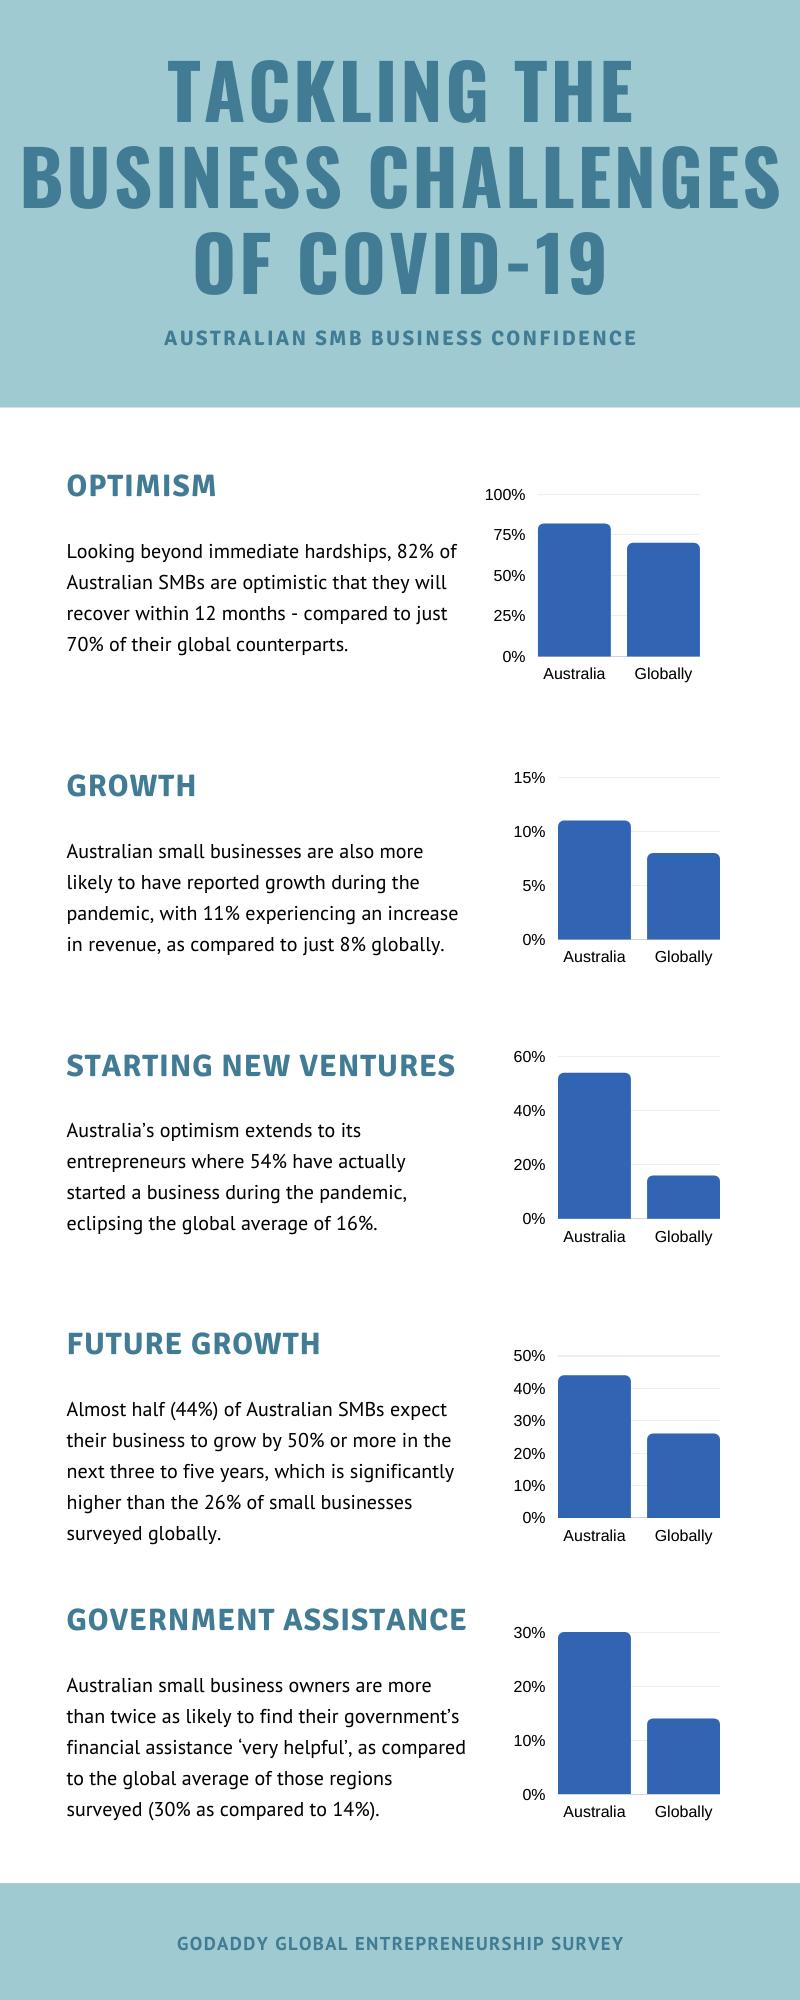 GoDaddy Global Entrepreneurship Survey Infographic